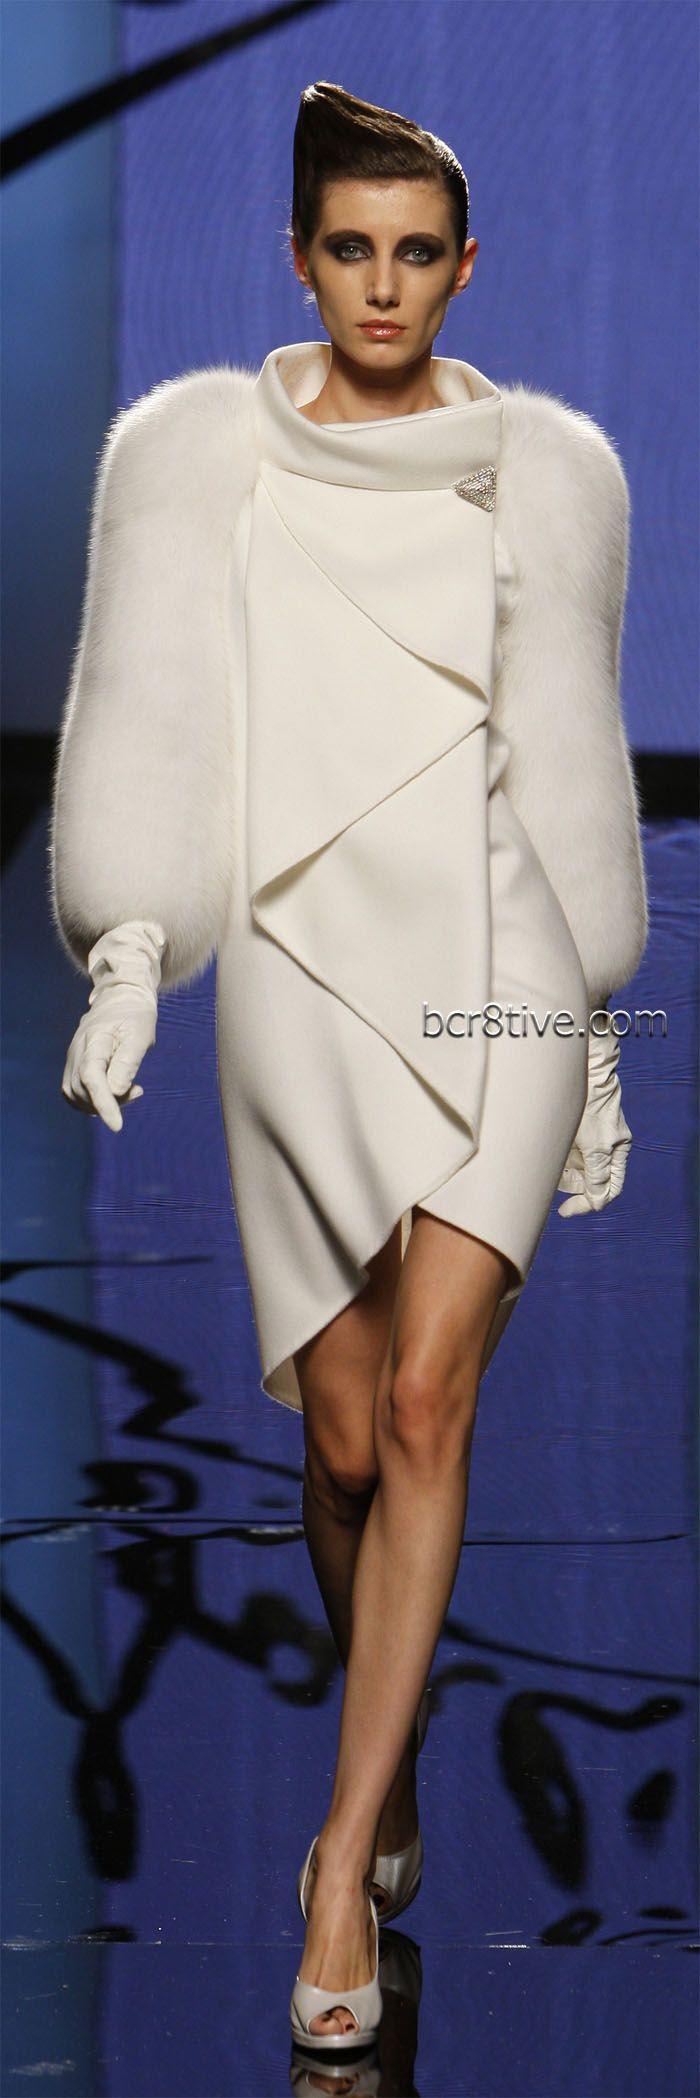 Fausto Sarli Couture - Fall Winter 2008